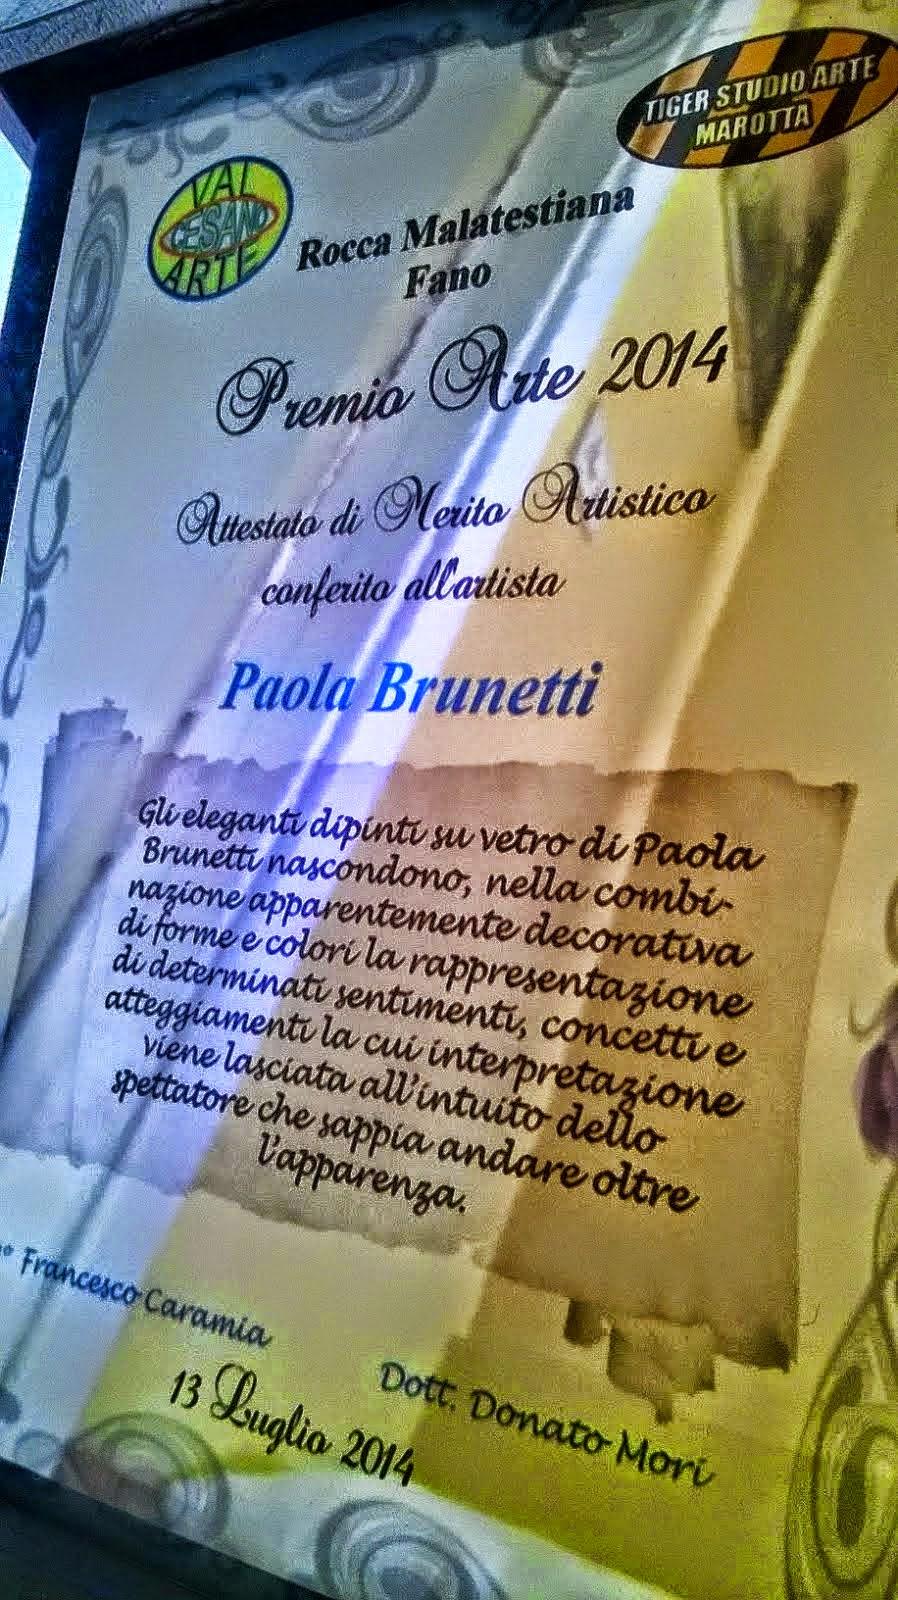 Fano (PU) 2014